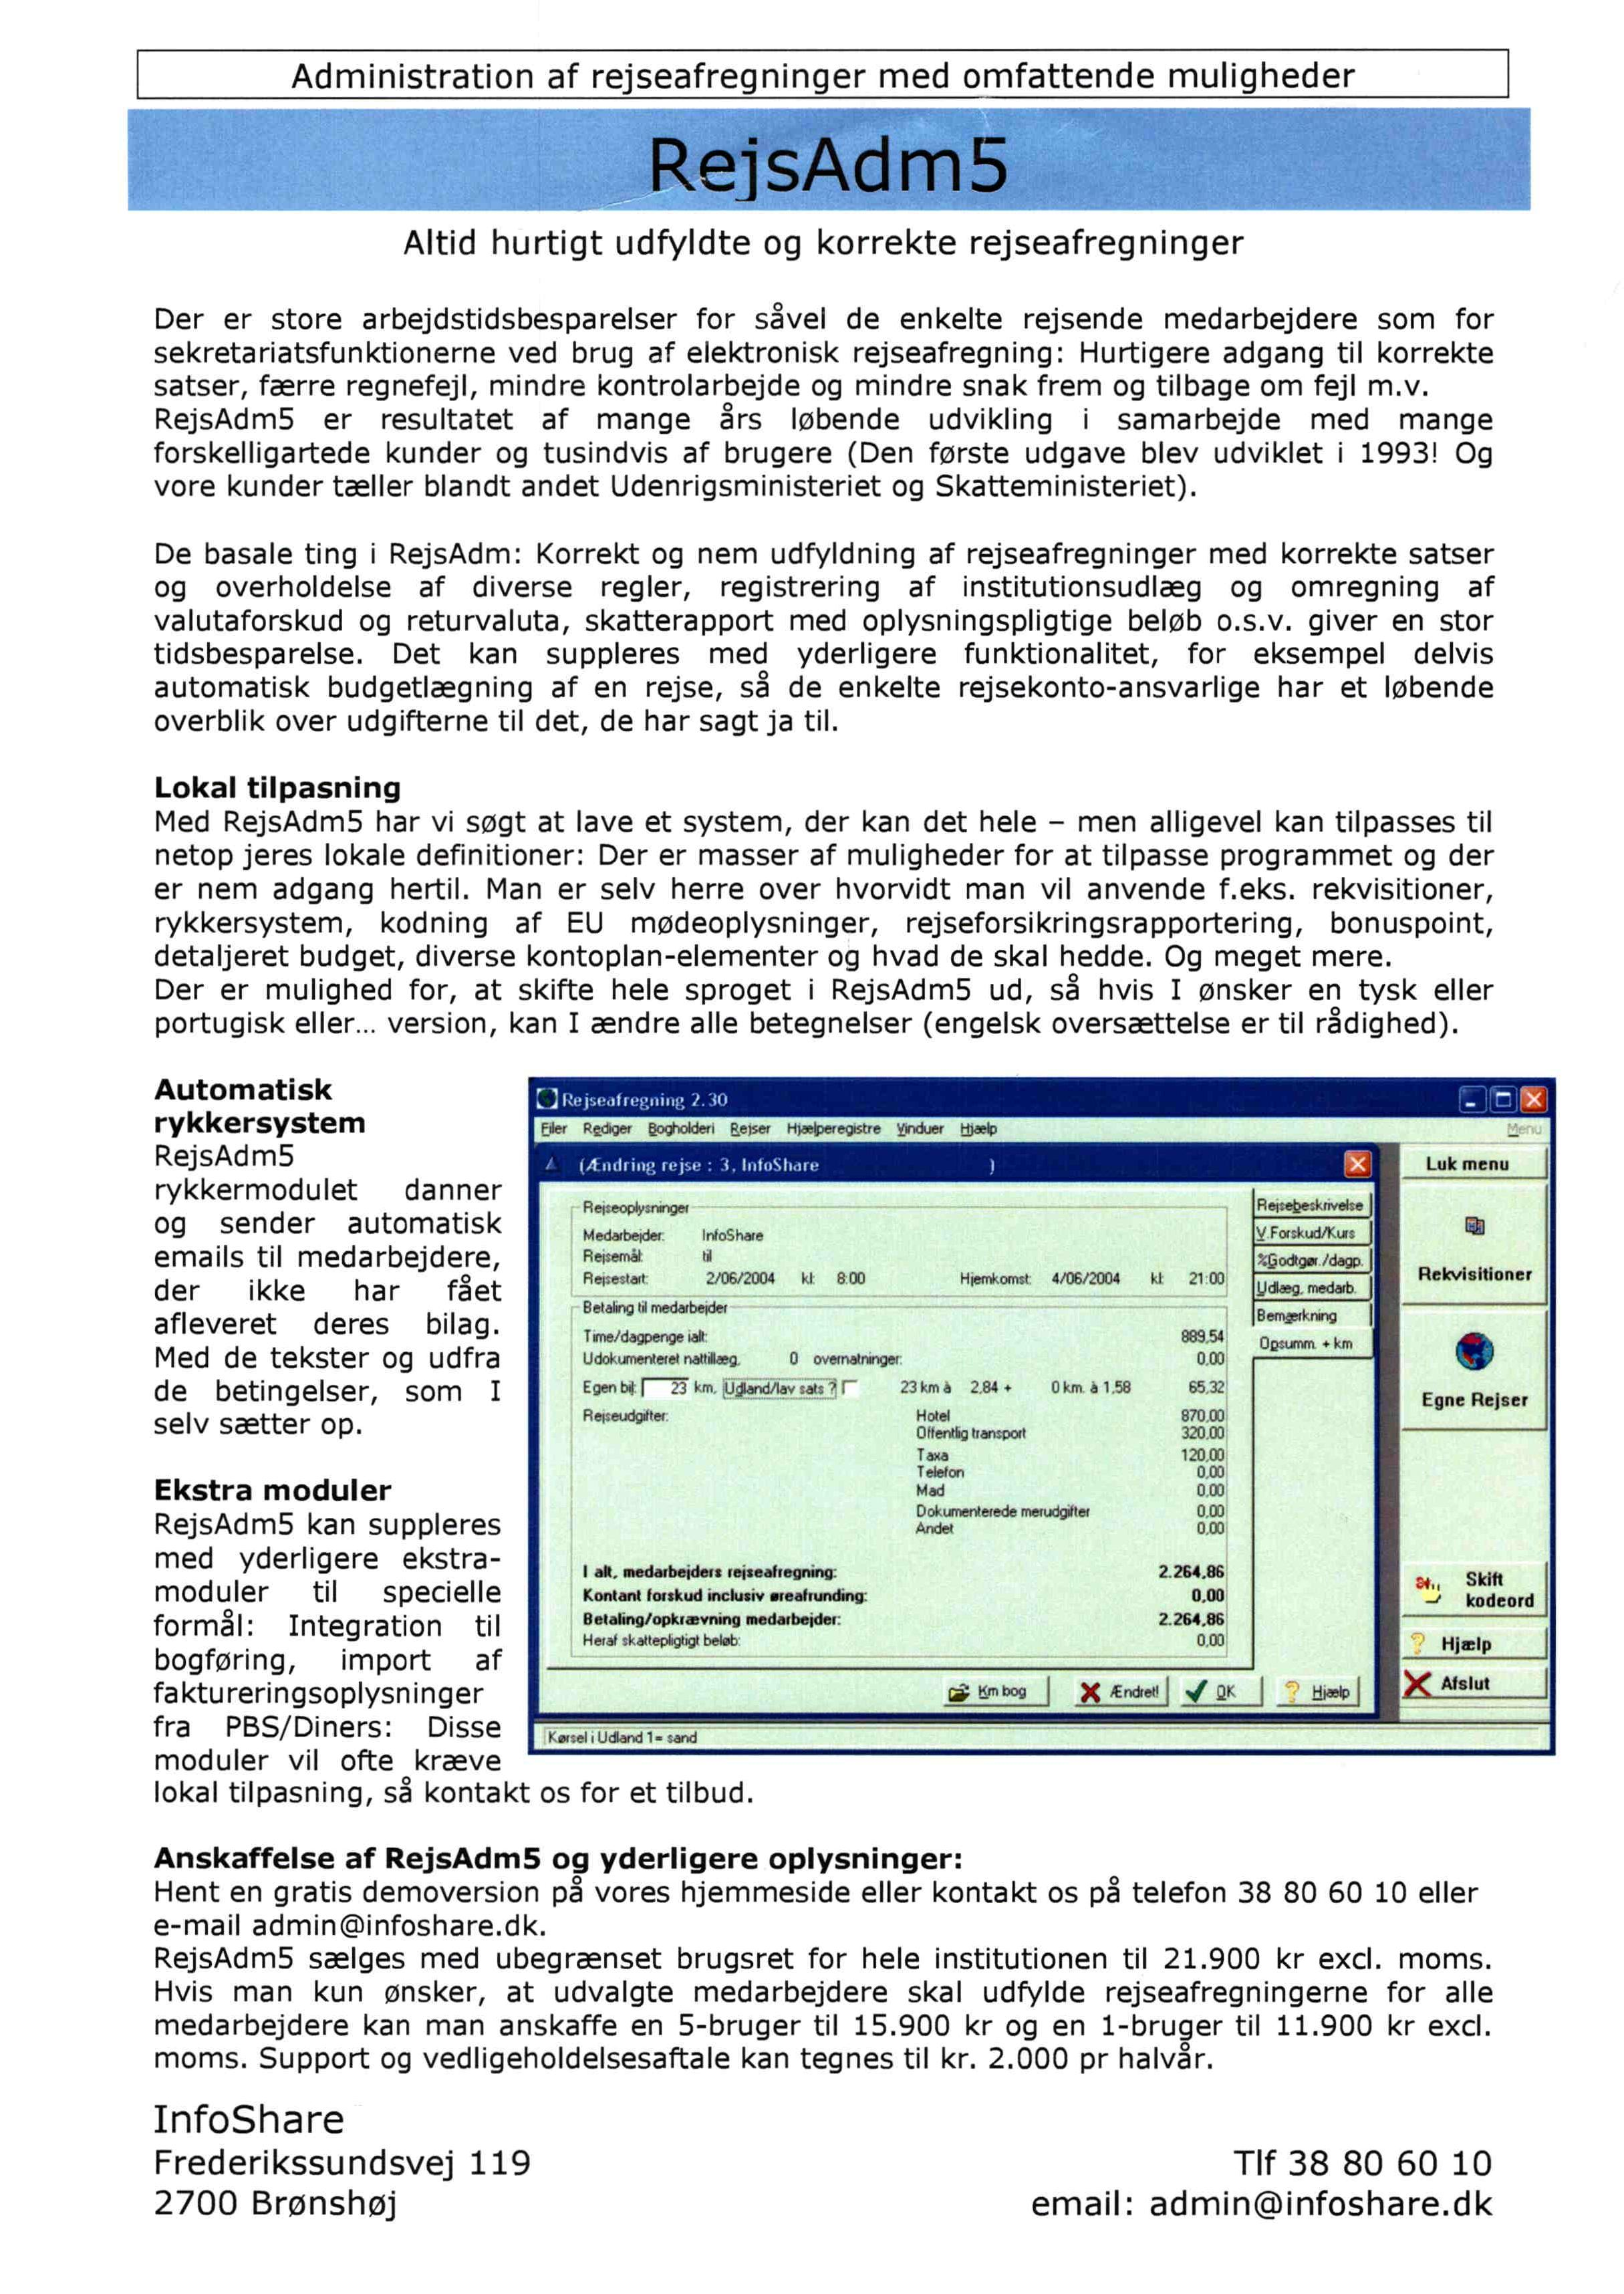 scan_2f423b9ec2_20180817_001281